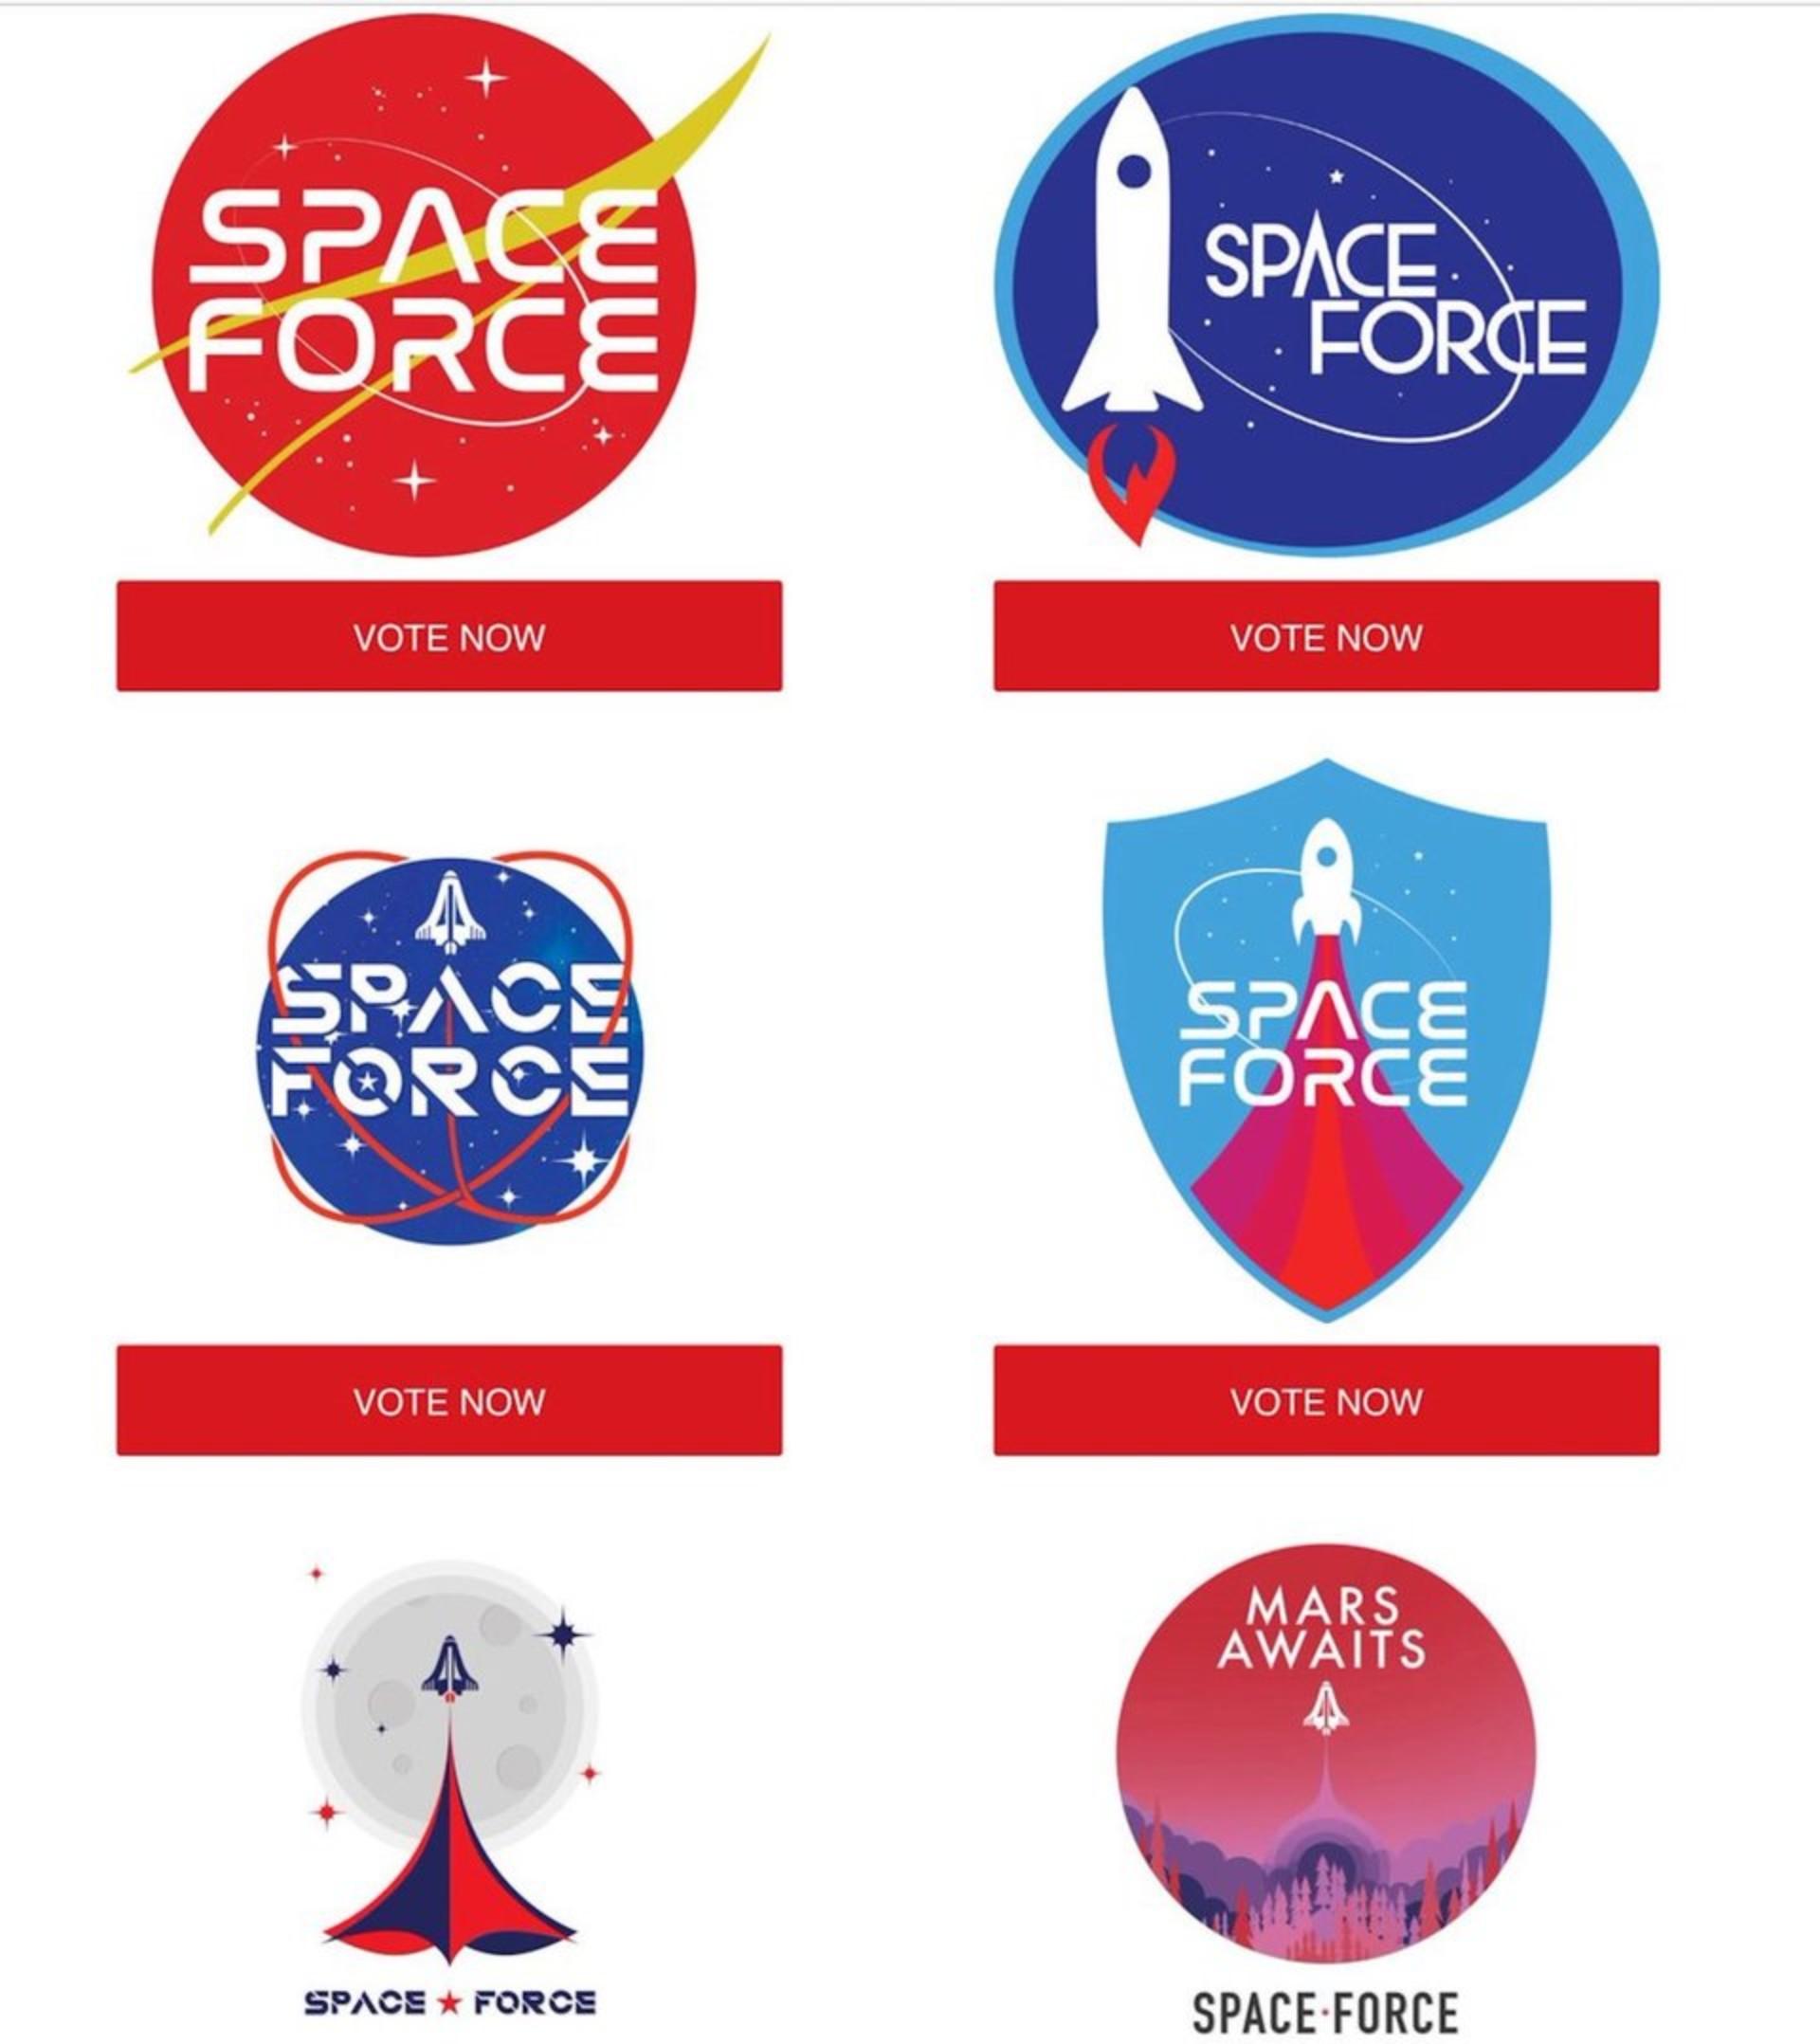 EU fija plan para crear Fuerza Espacial para 2020